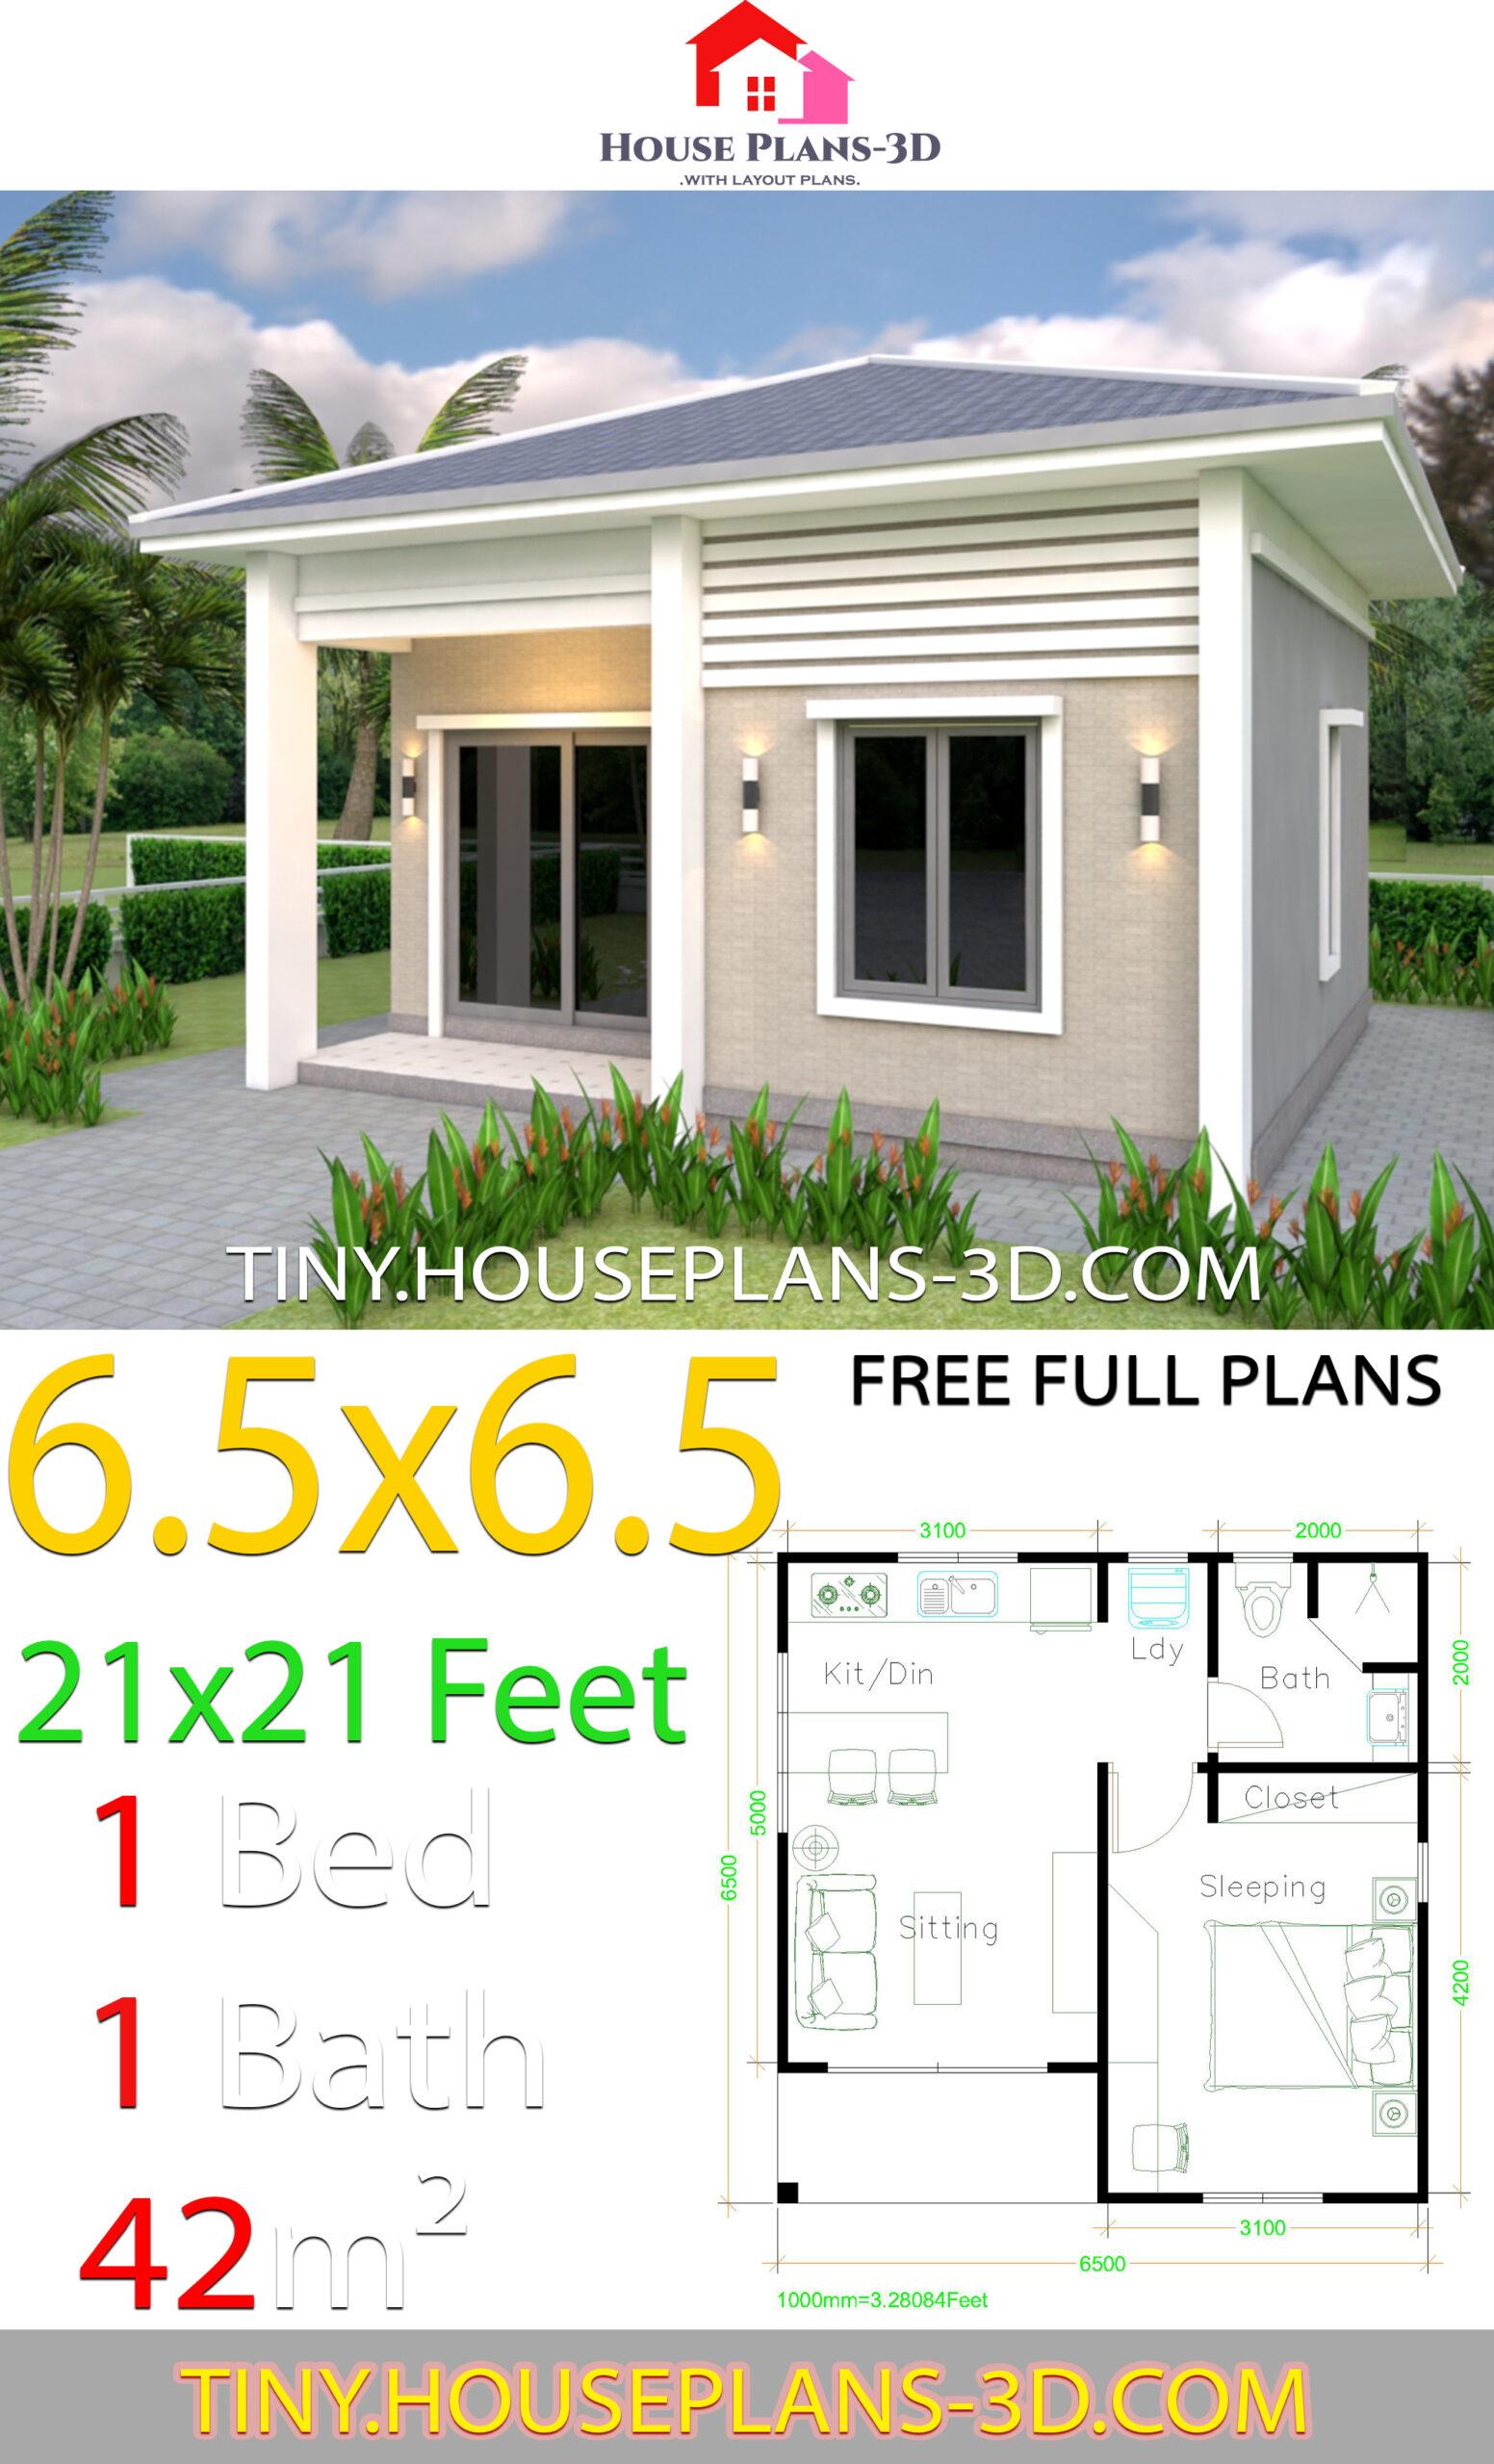 Hip roof Simple House Plans 21x21 Feet 6.5x6.5m